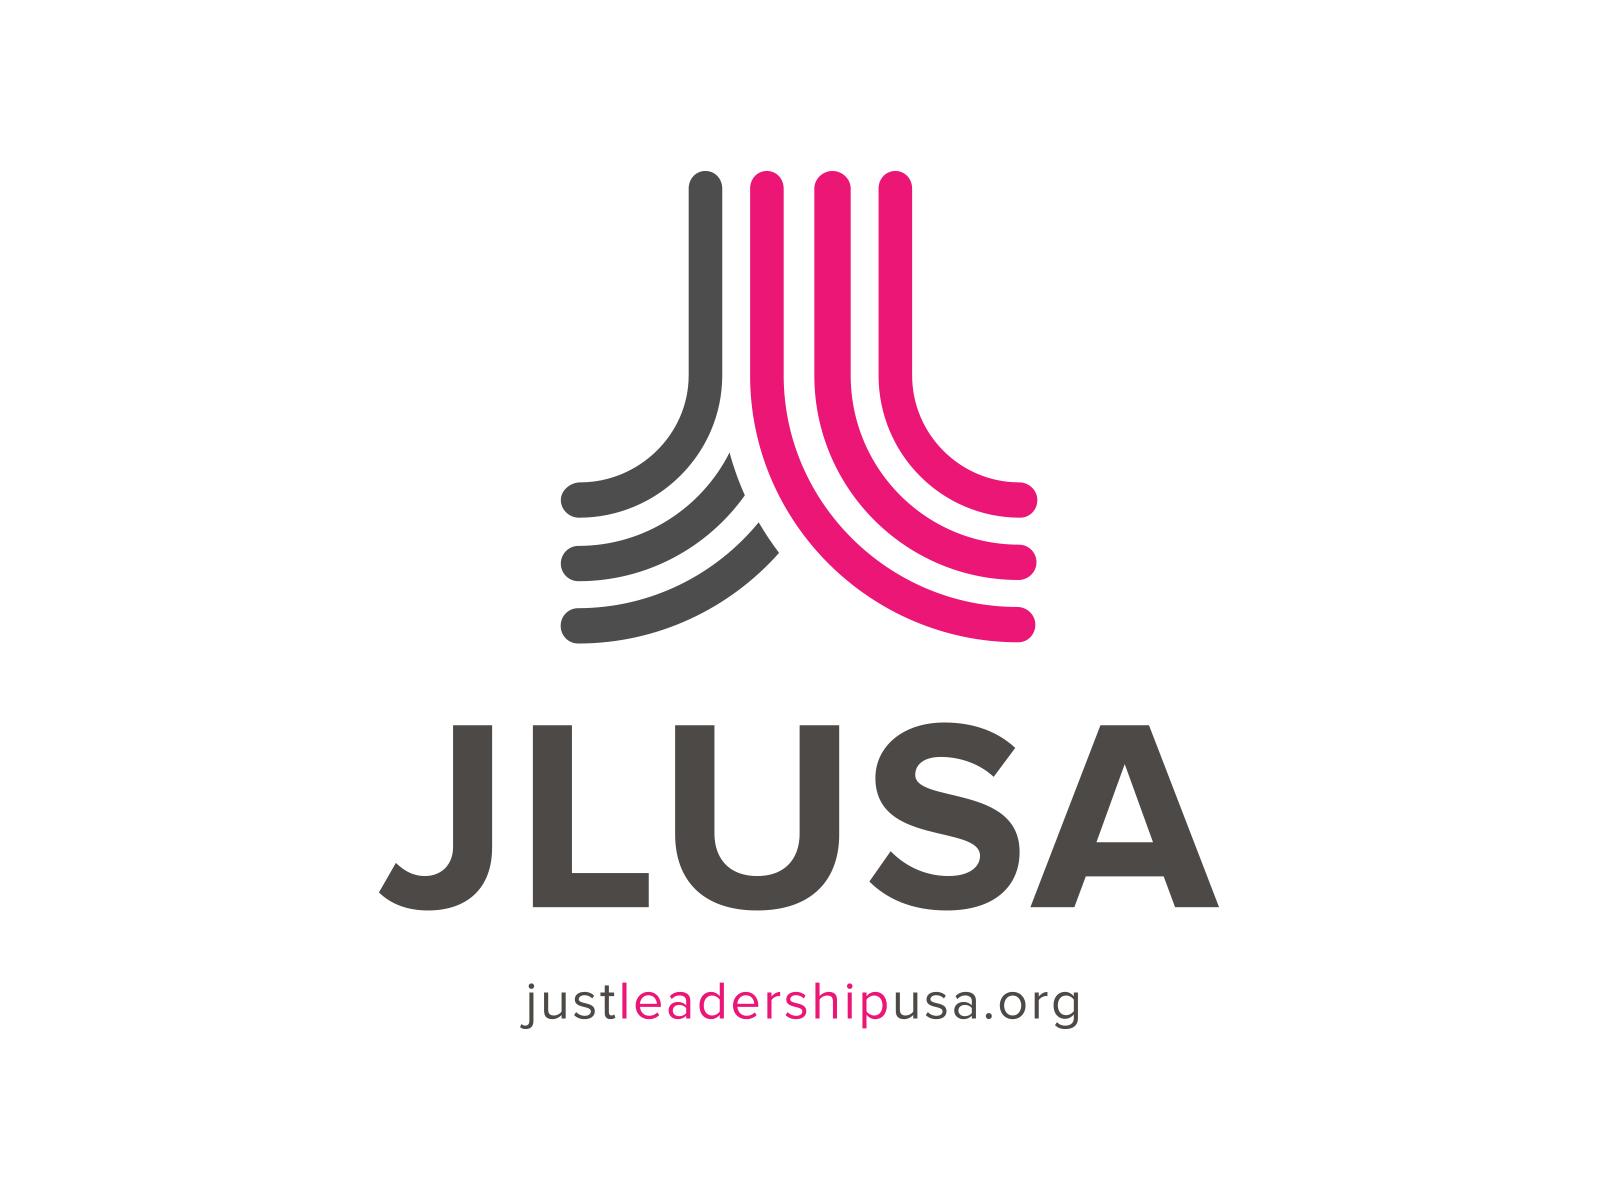 JLUSA